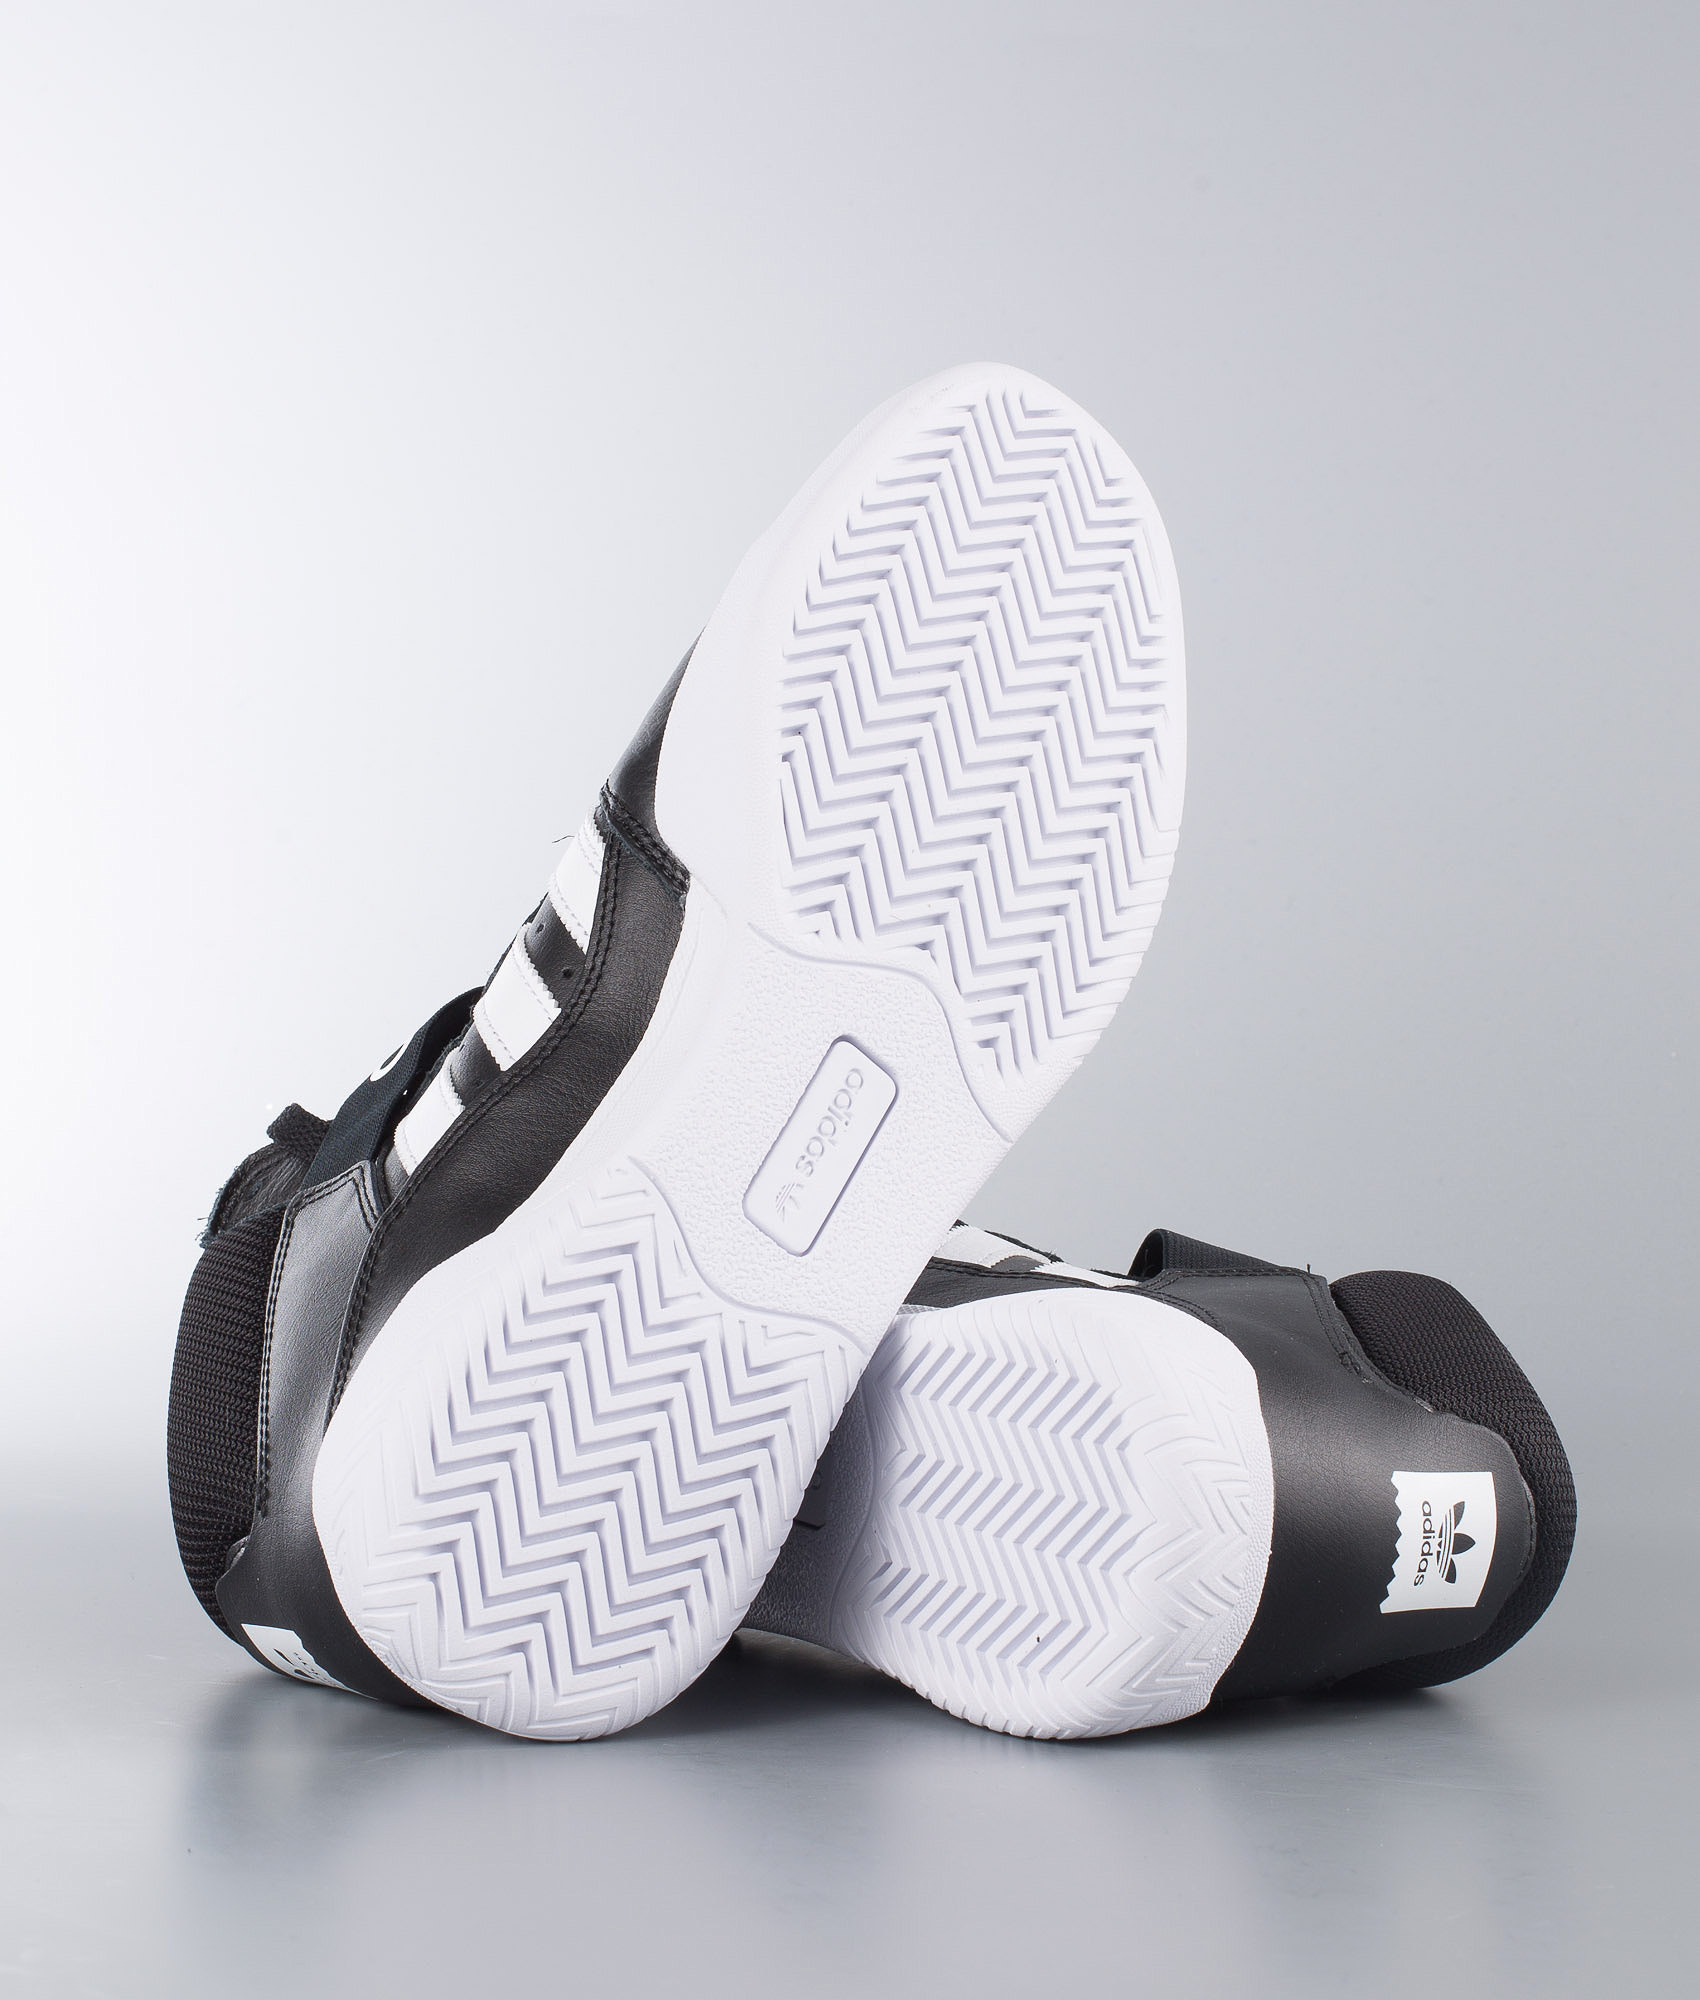 ce367d35d4b9 Adidas Skateboarding Vrx Mid Shoes Core Black Ftwr White Ftwr White ...